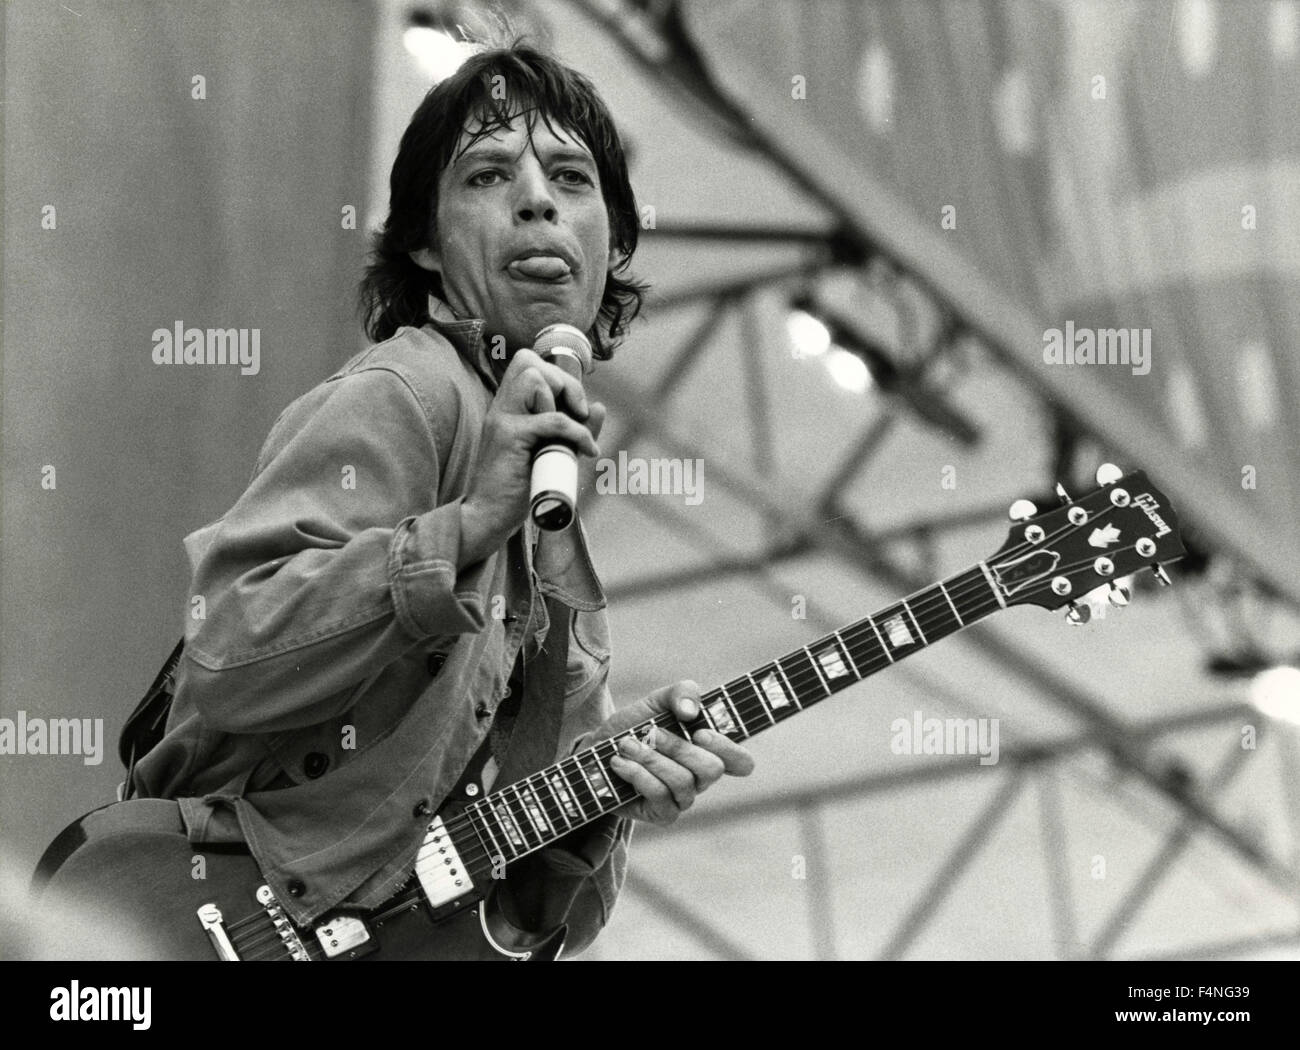 Mick Jagger, musician, UK - Stock Image